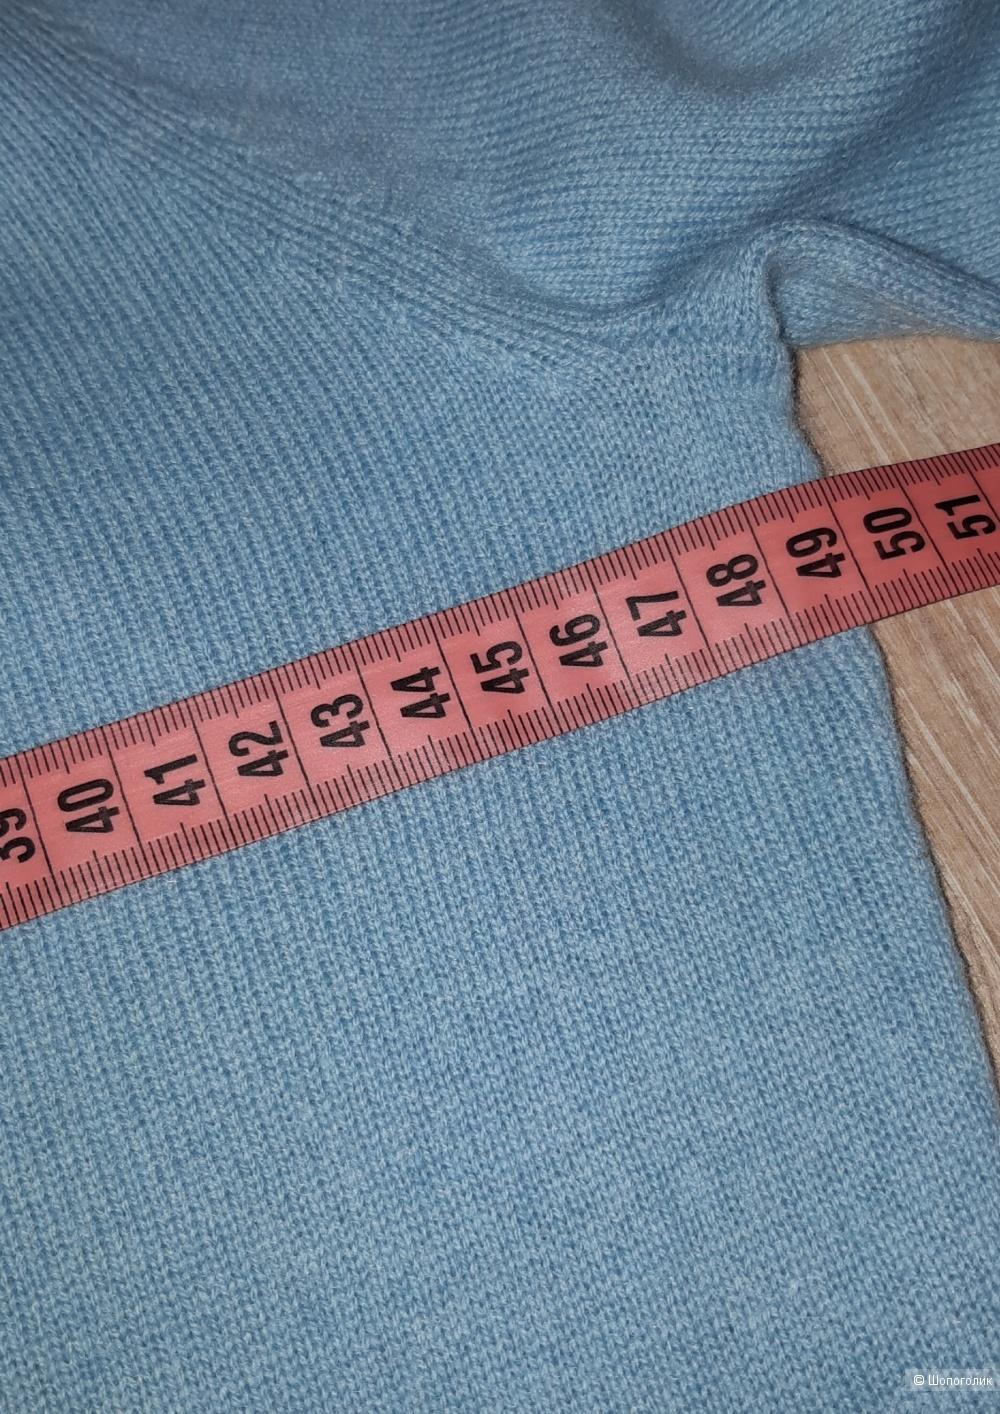 Шерстяная водолазка benetton, размер 46/48